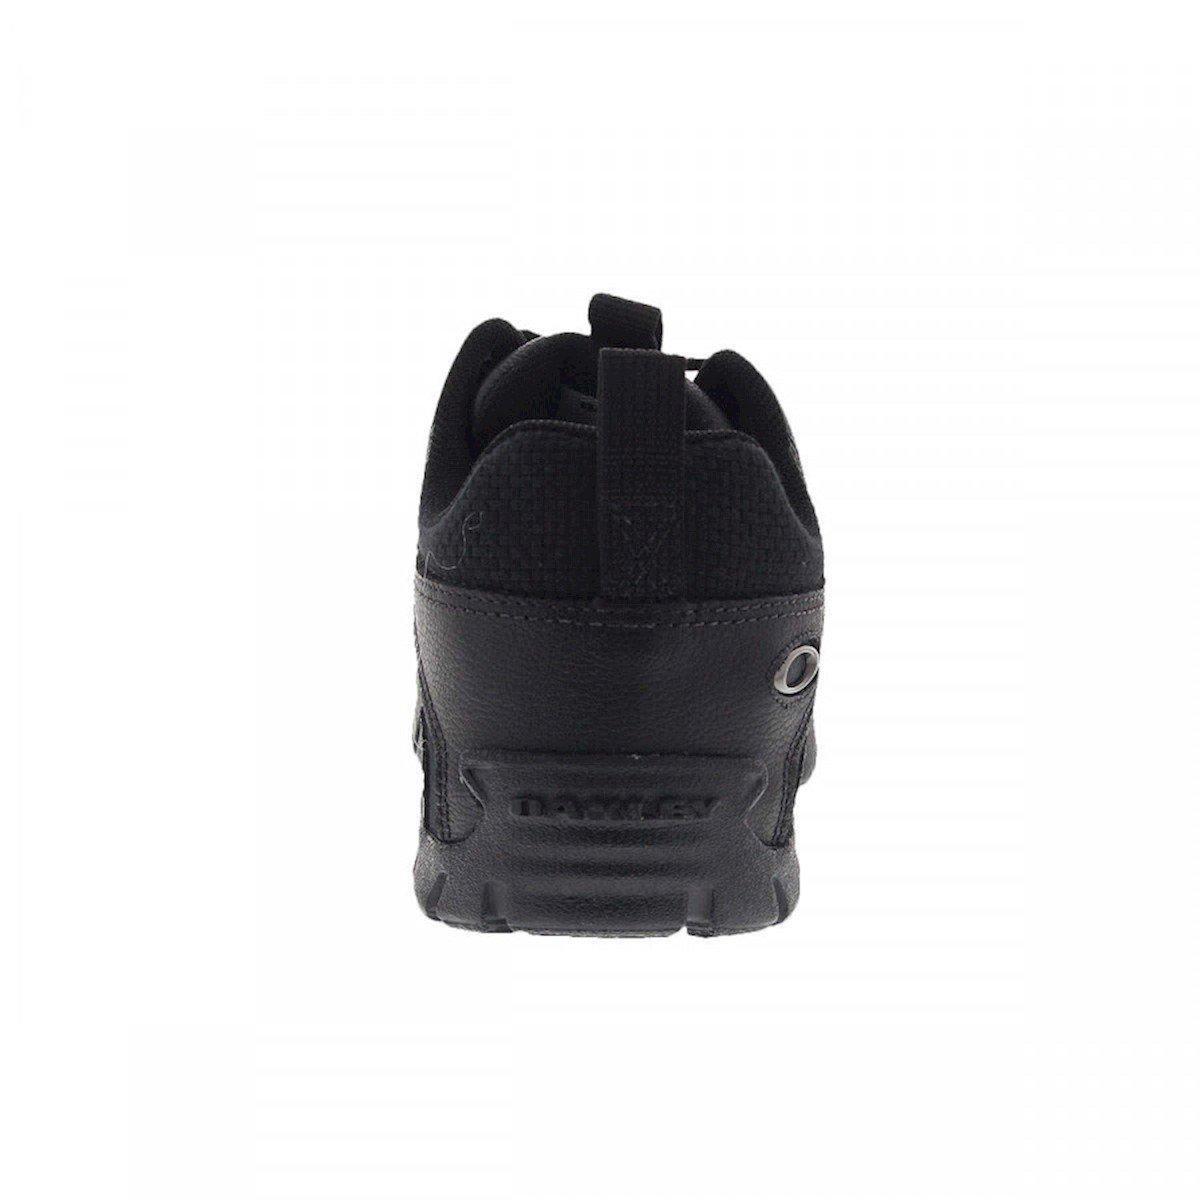 Tênis Botinha Oakley Flak 1.2 Masculino - Compre Agora   Netshoes 1688795d49